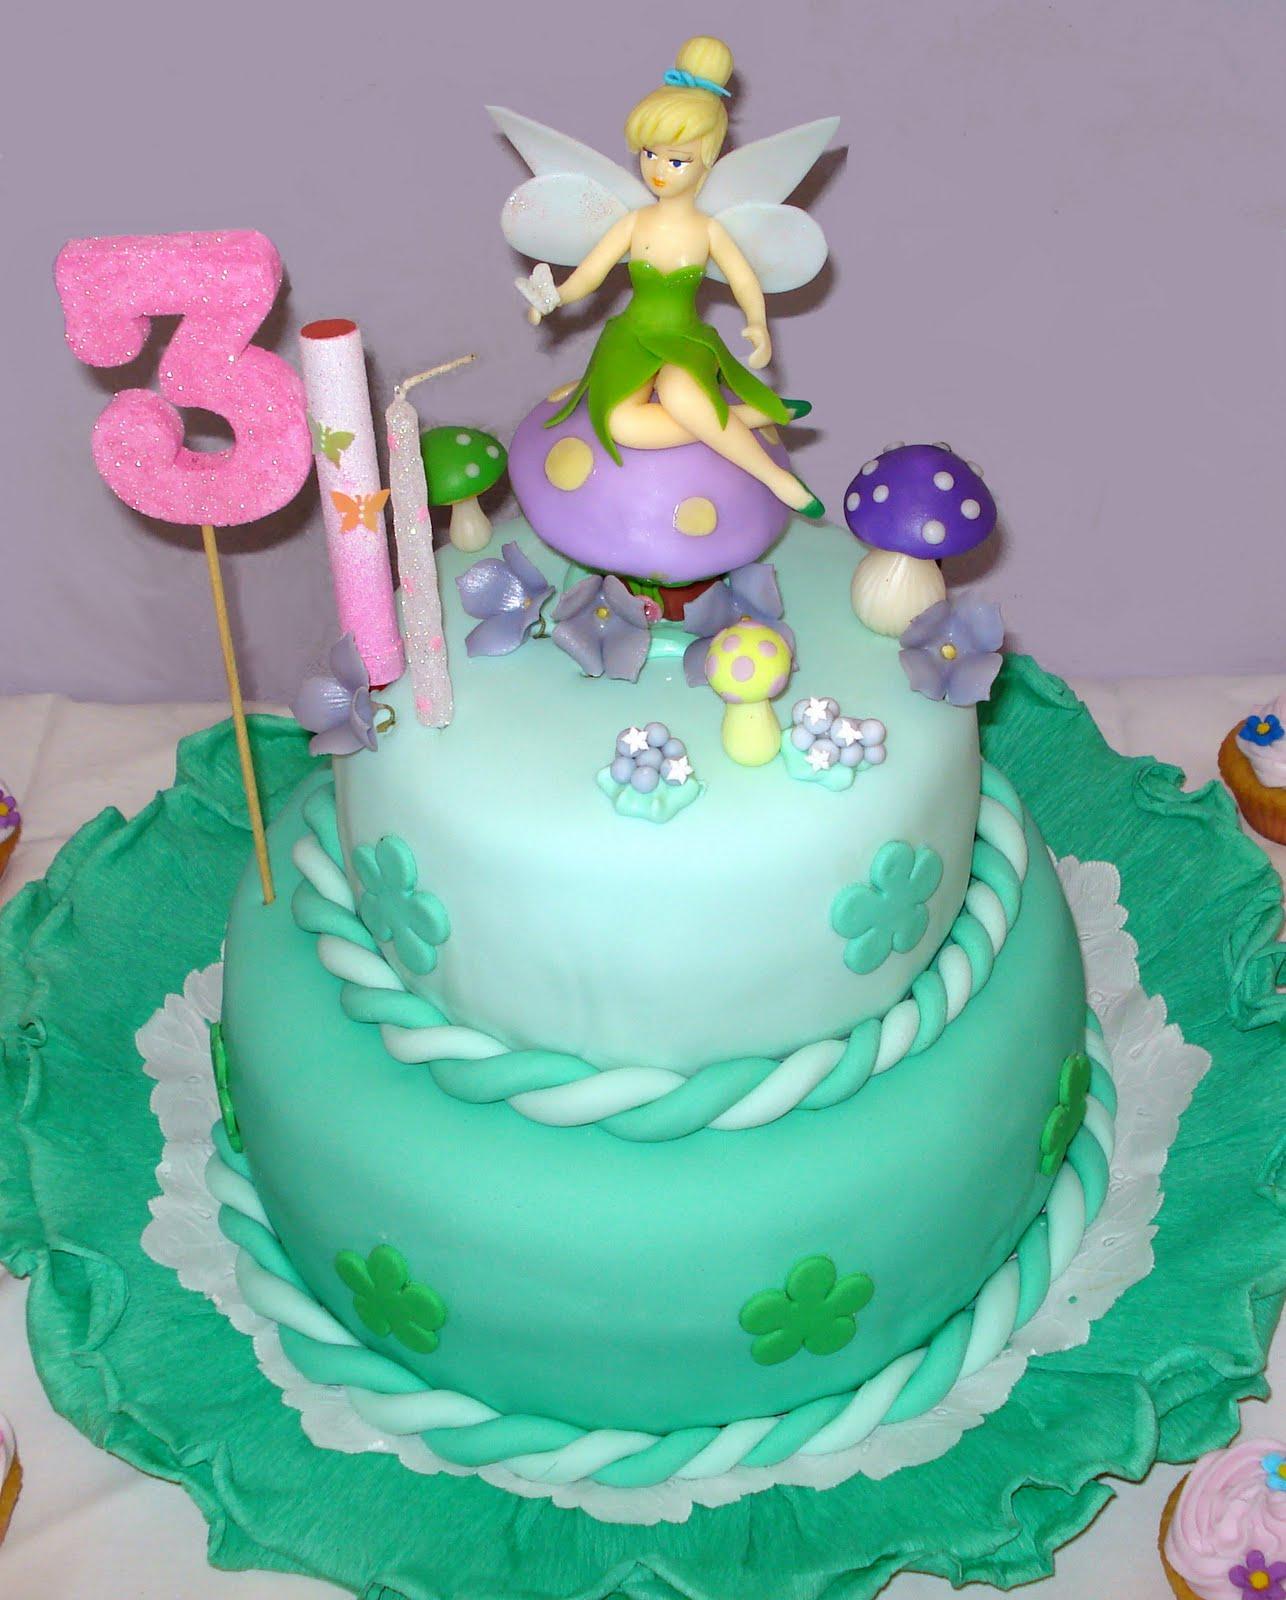 Imagenes de tortas con Tinkerbell - Imagui